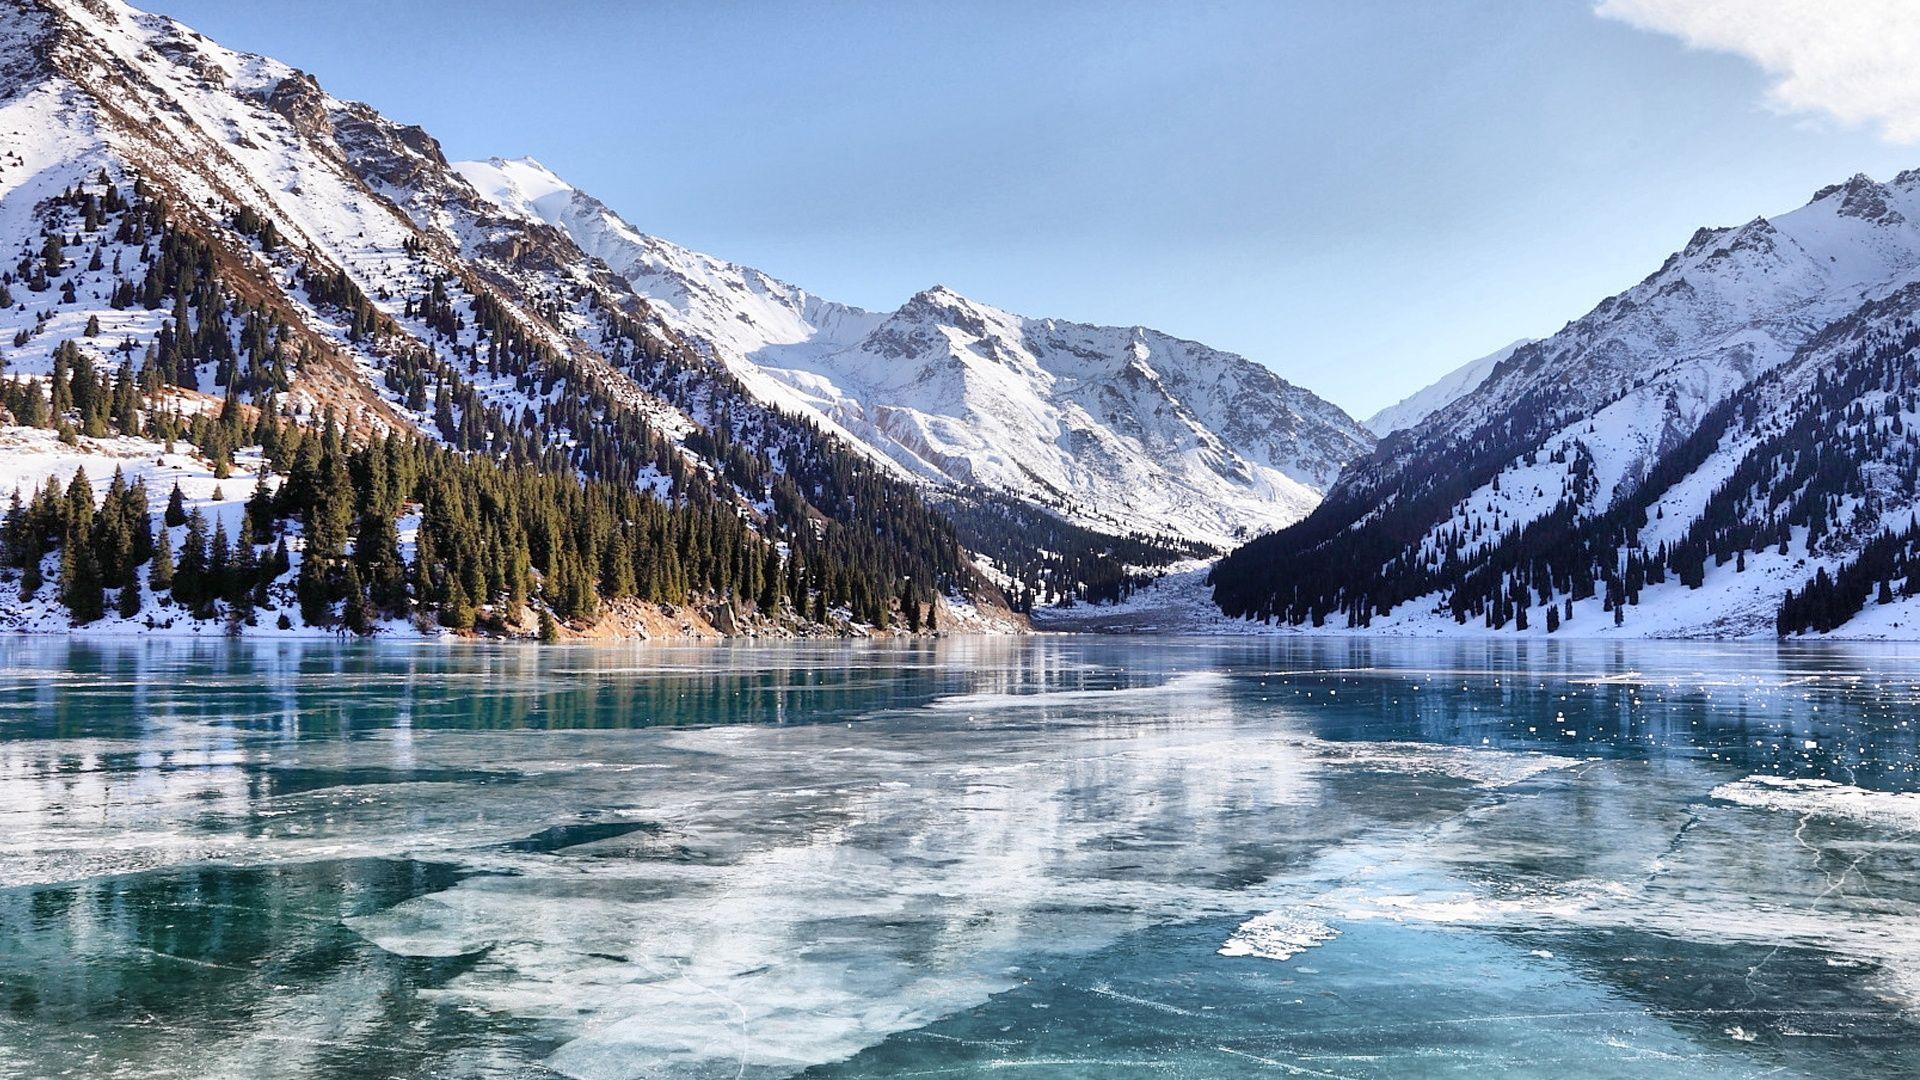 Almaty Winter Lake Paysage Hiver Paysage Montagne Scene D Hiver